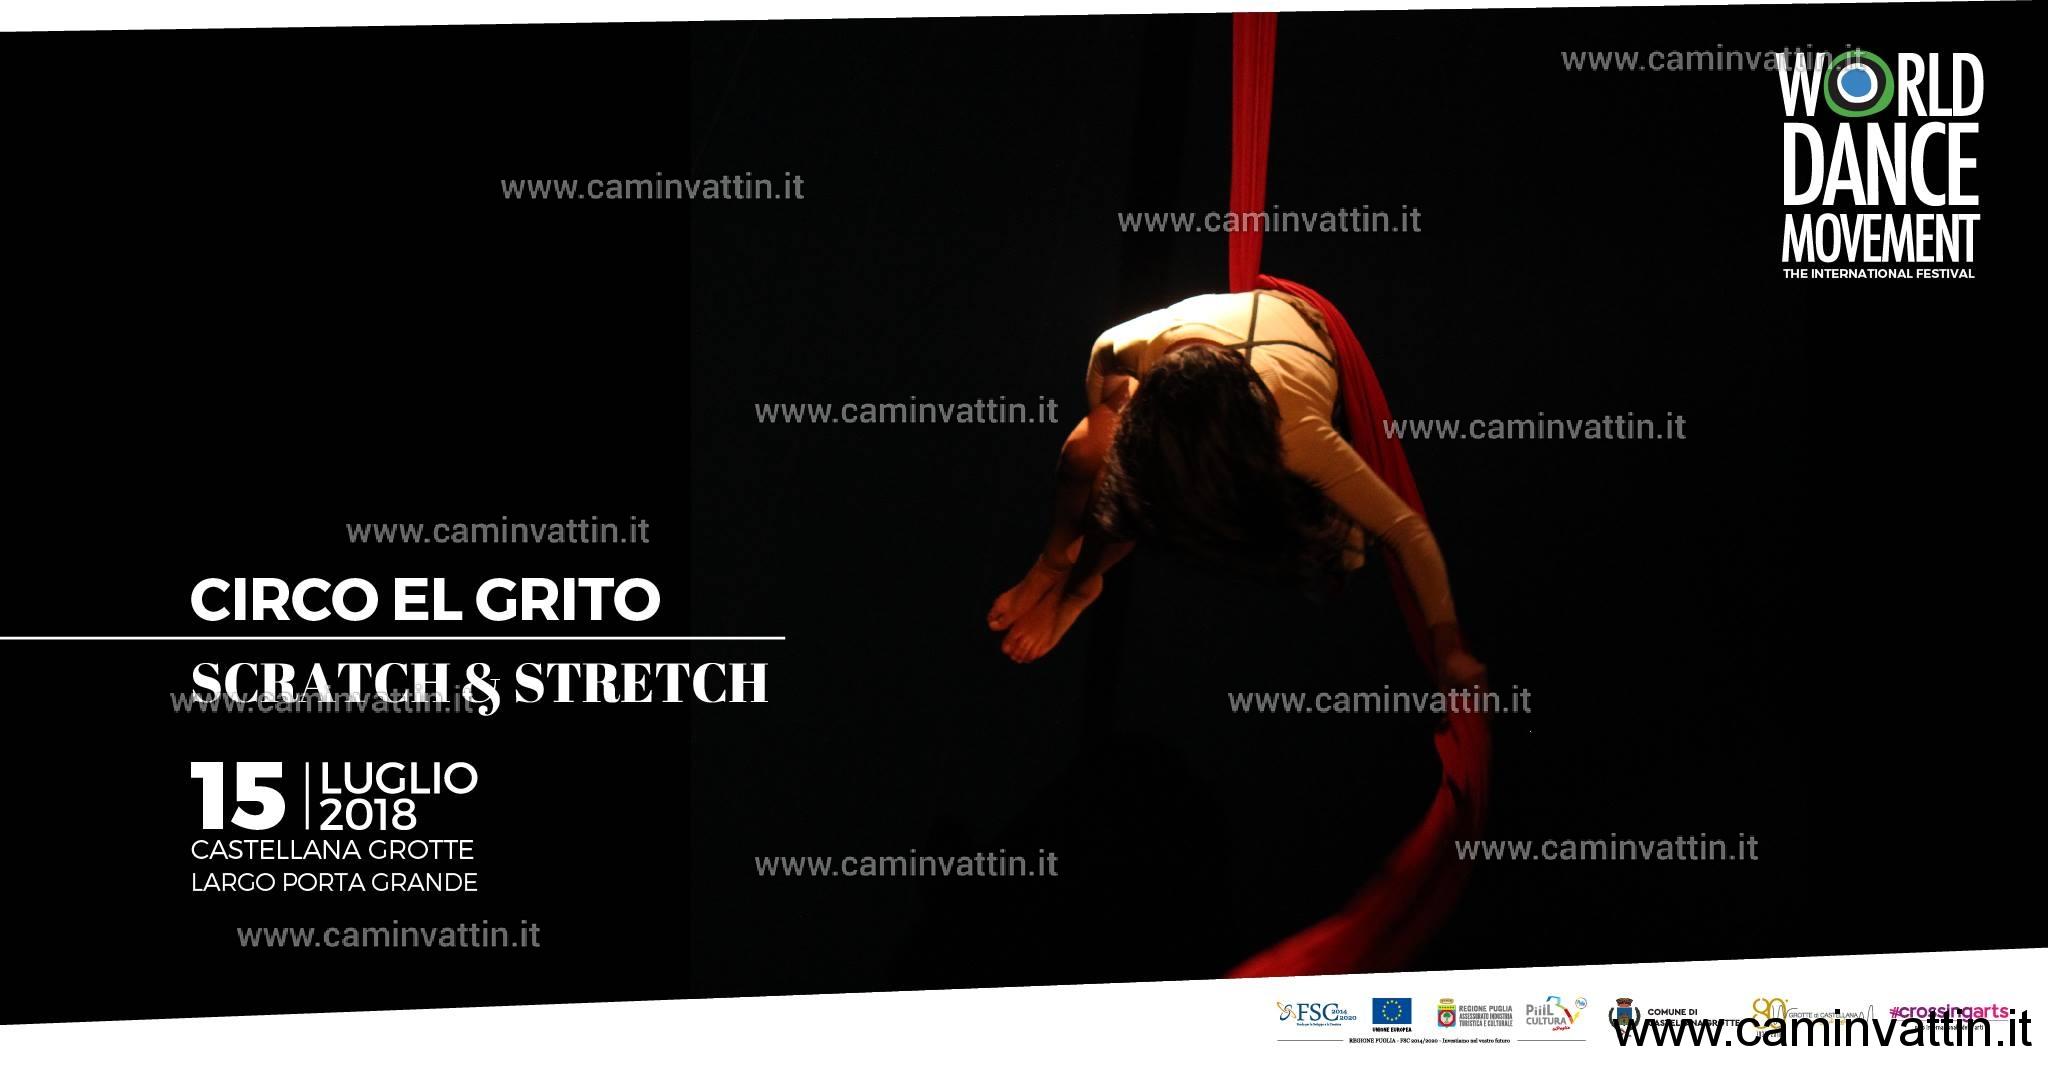 Circo El Grito Scratch e Stretch